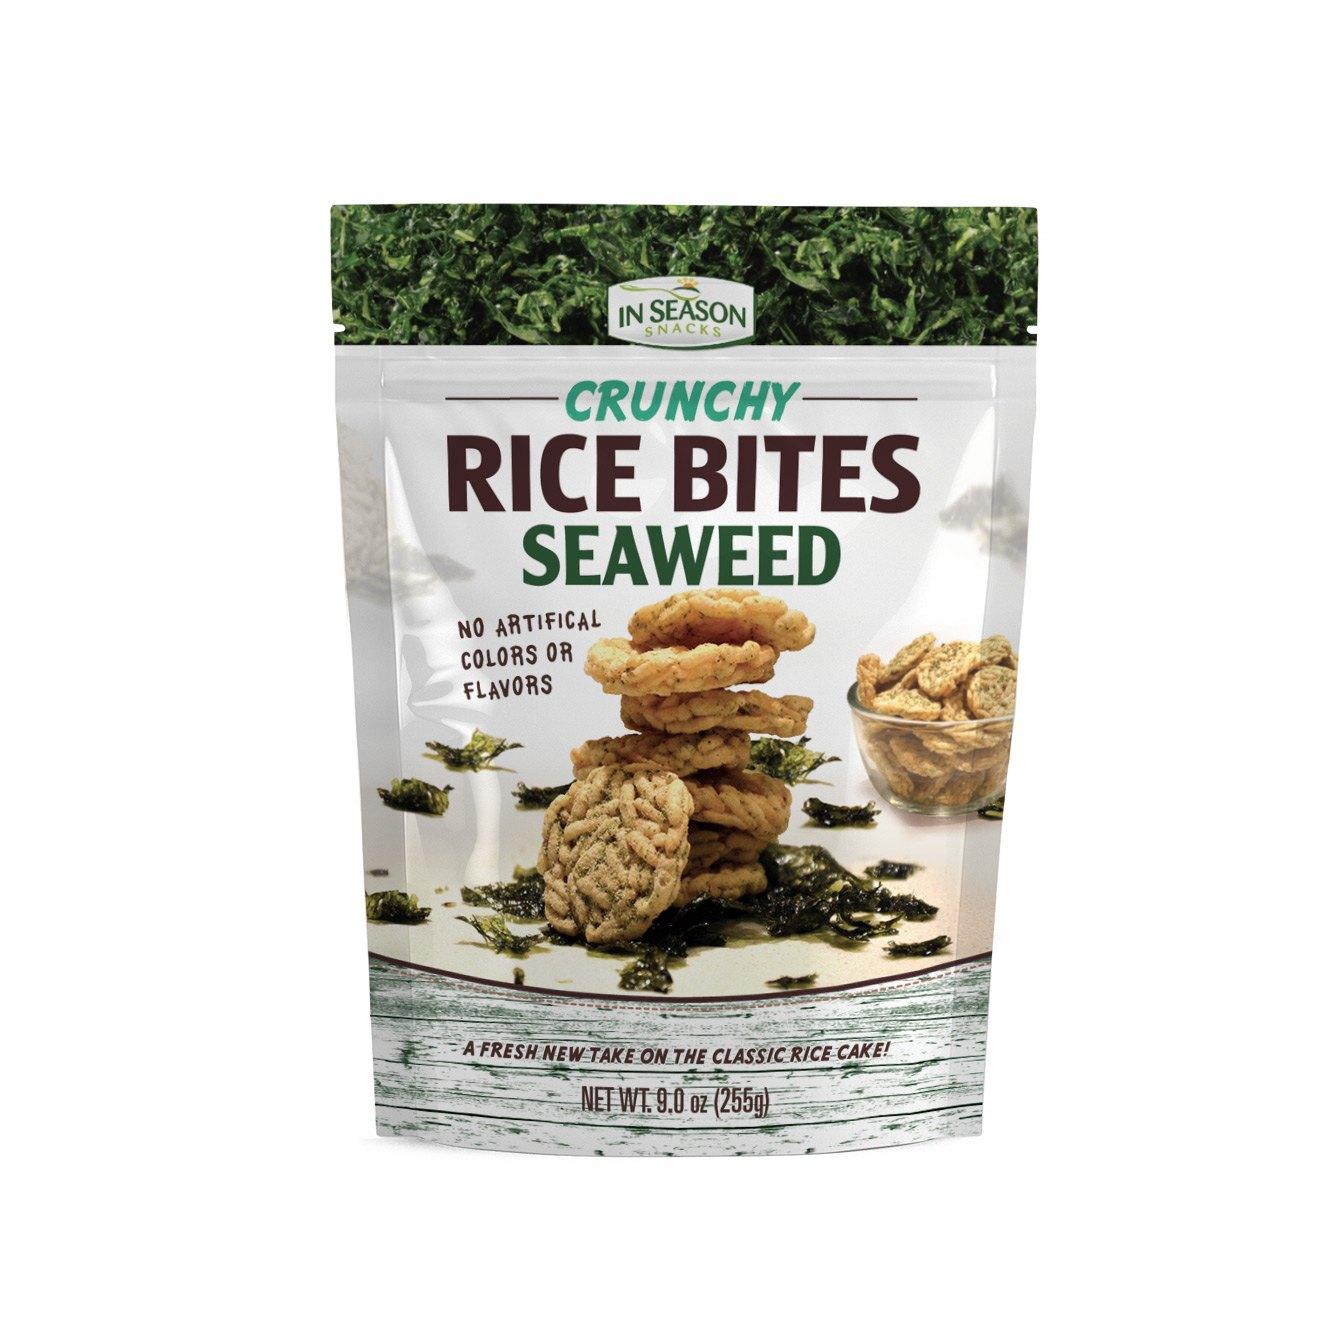 Seaweed crunchy rice bites costco